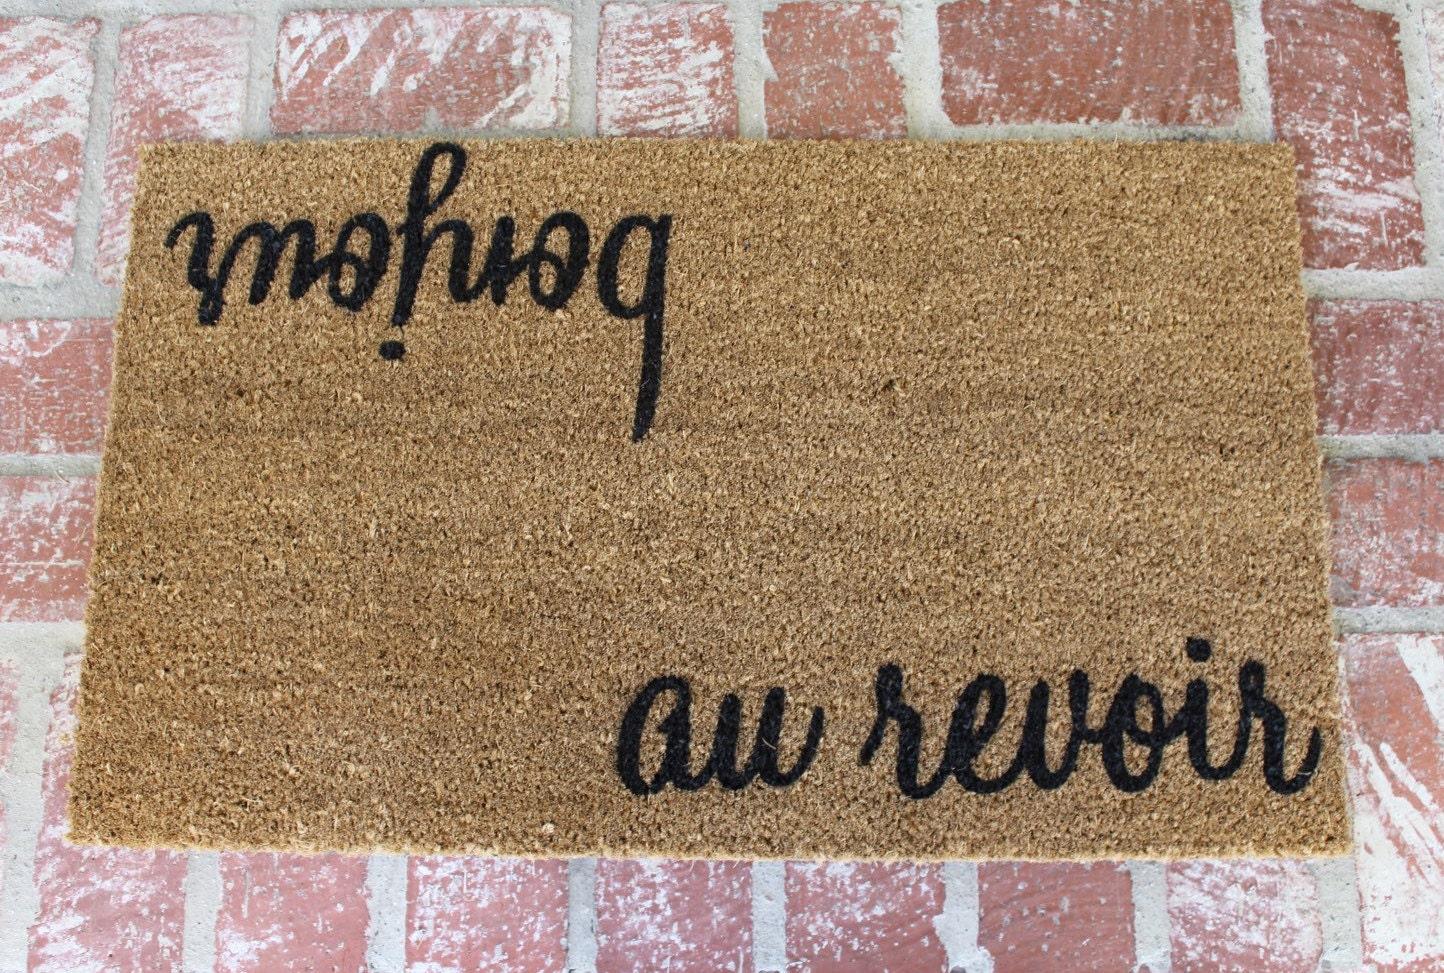 New Bonjour Au Revoir Doormat 18x30 Outdoor Mat